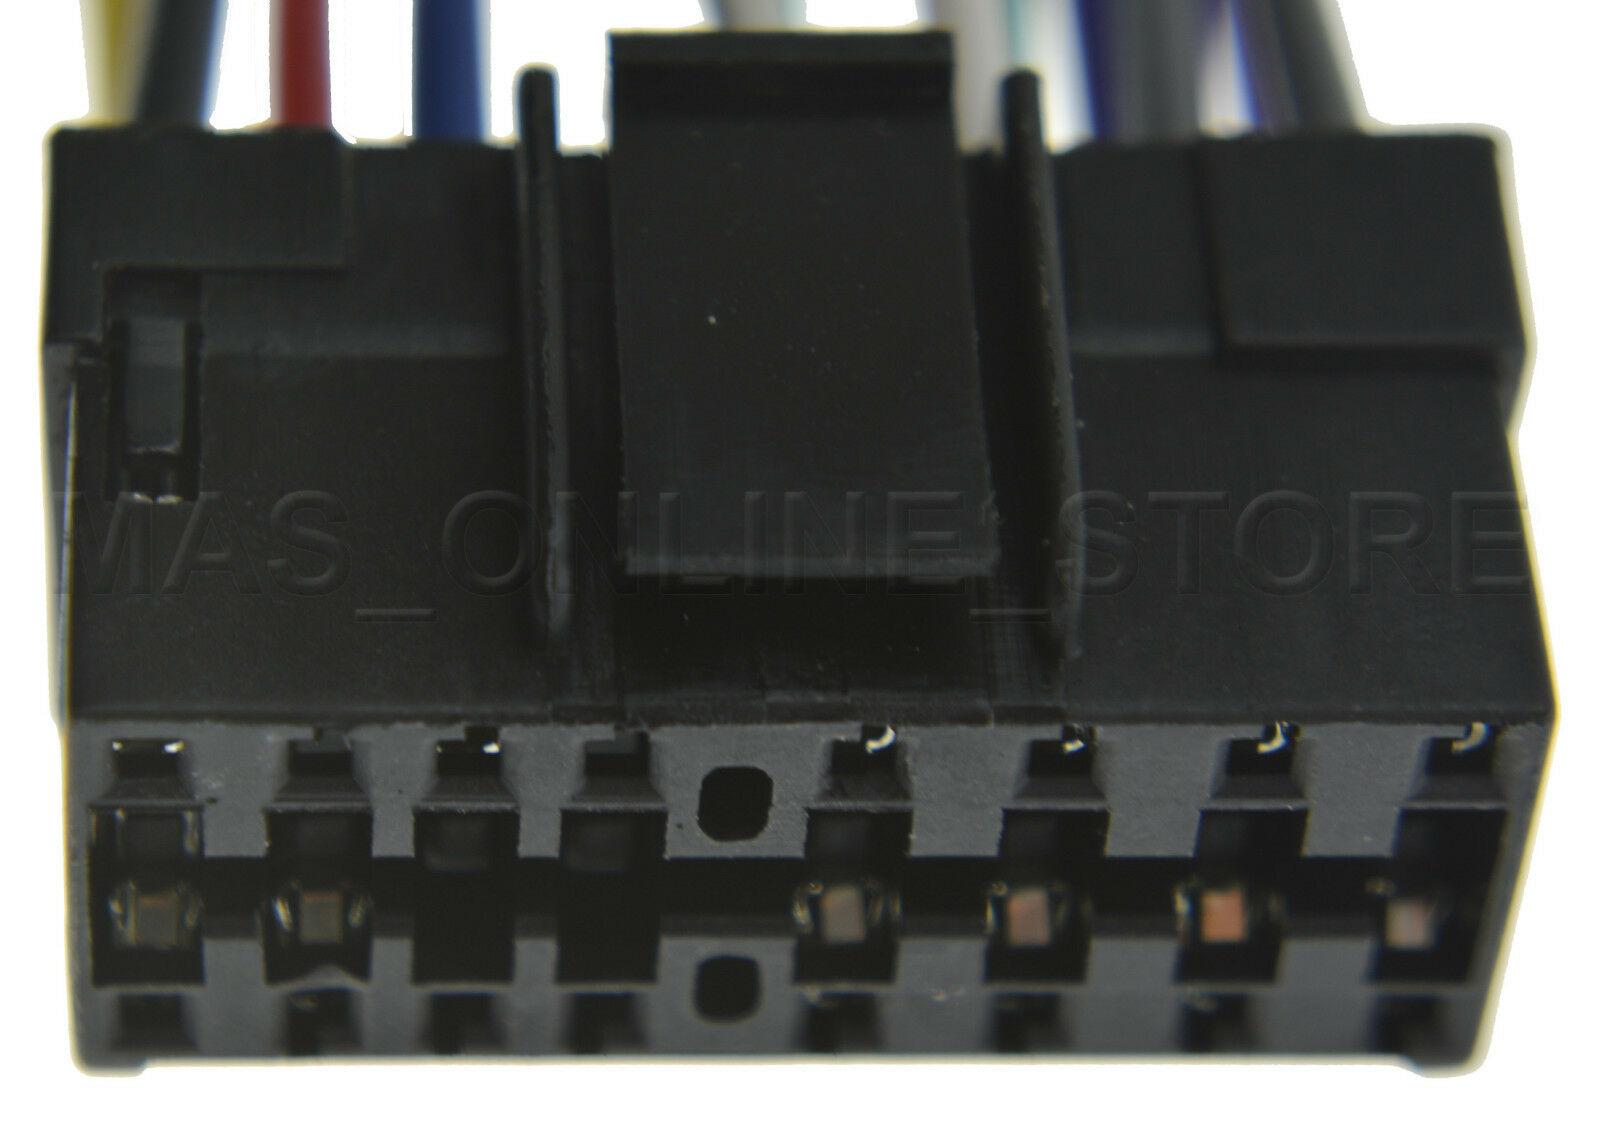 Peachy Pioneer Deh P41 Car Audio Wiring Wiring Library Wiring Cloud Biosomenaidewilluminateatxorg